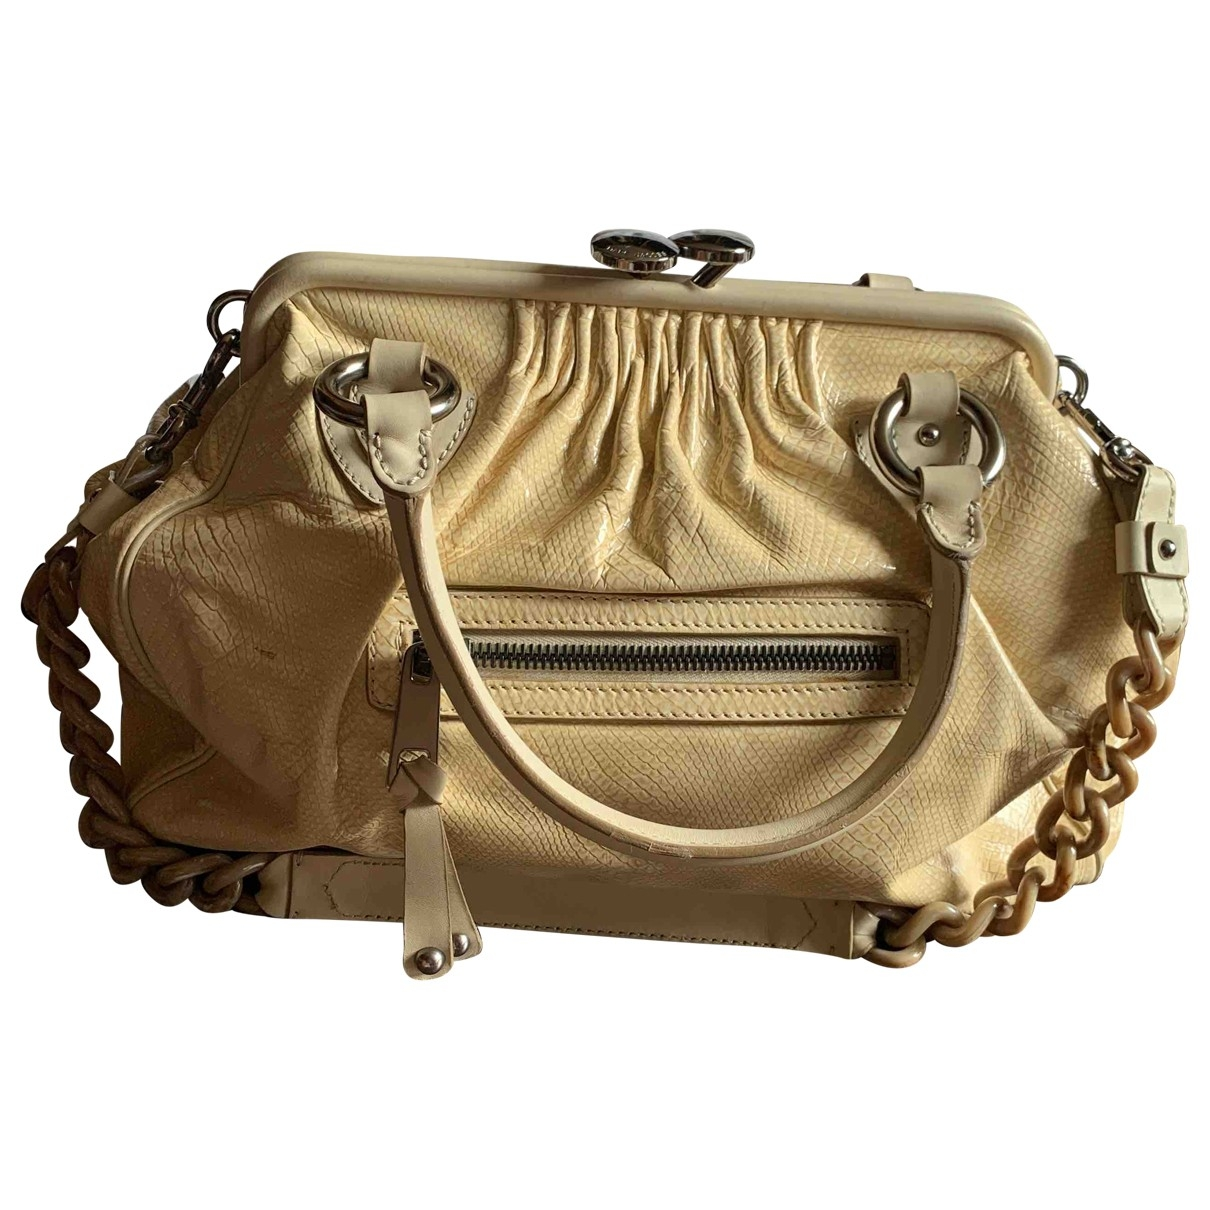 Marc Jacobs Stam Handtasche in  Beige Leder